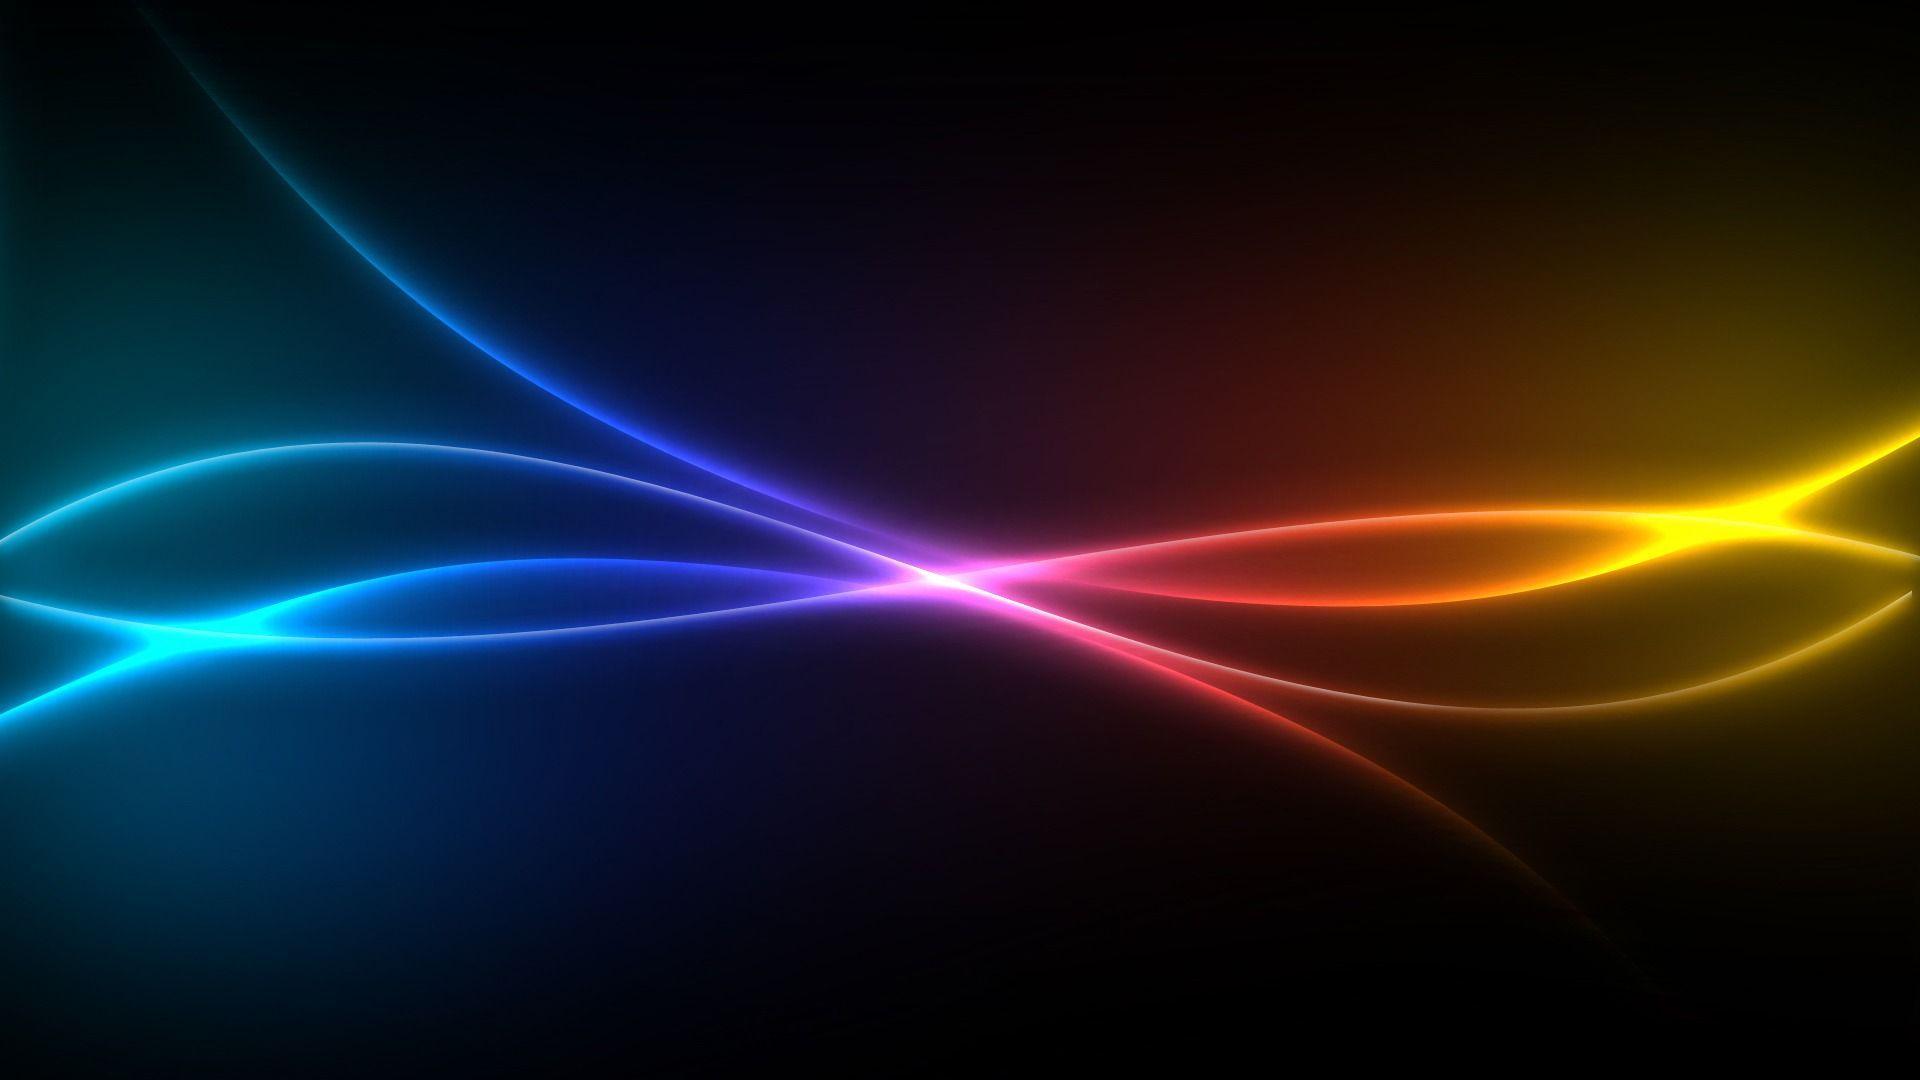 neon lights wallpaper - photo #5